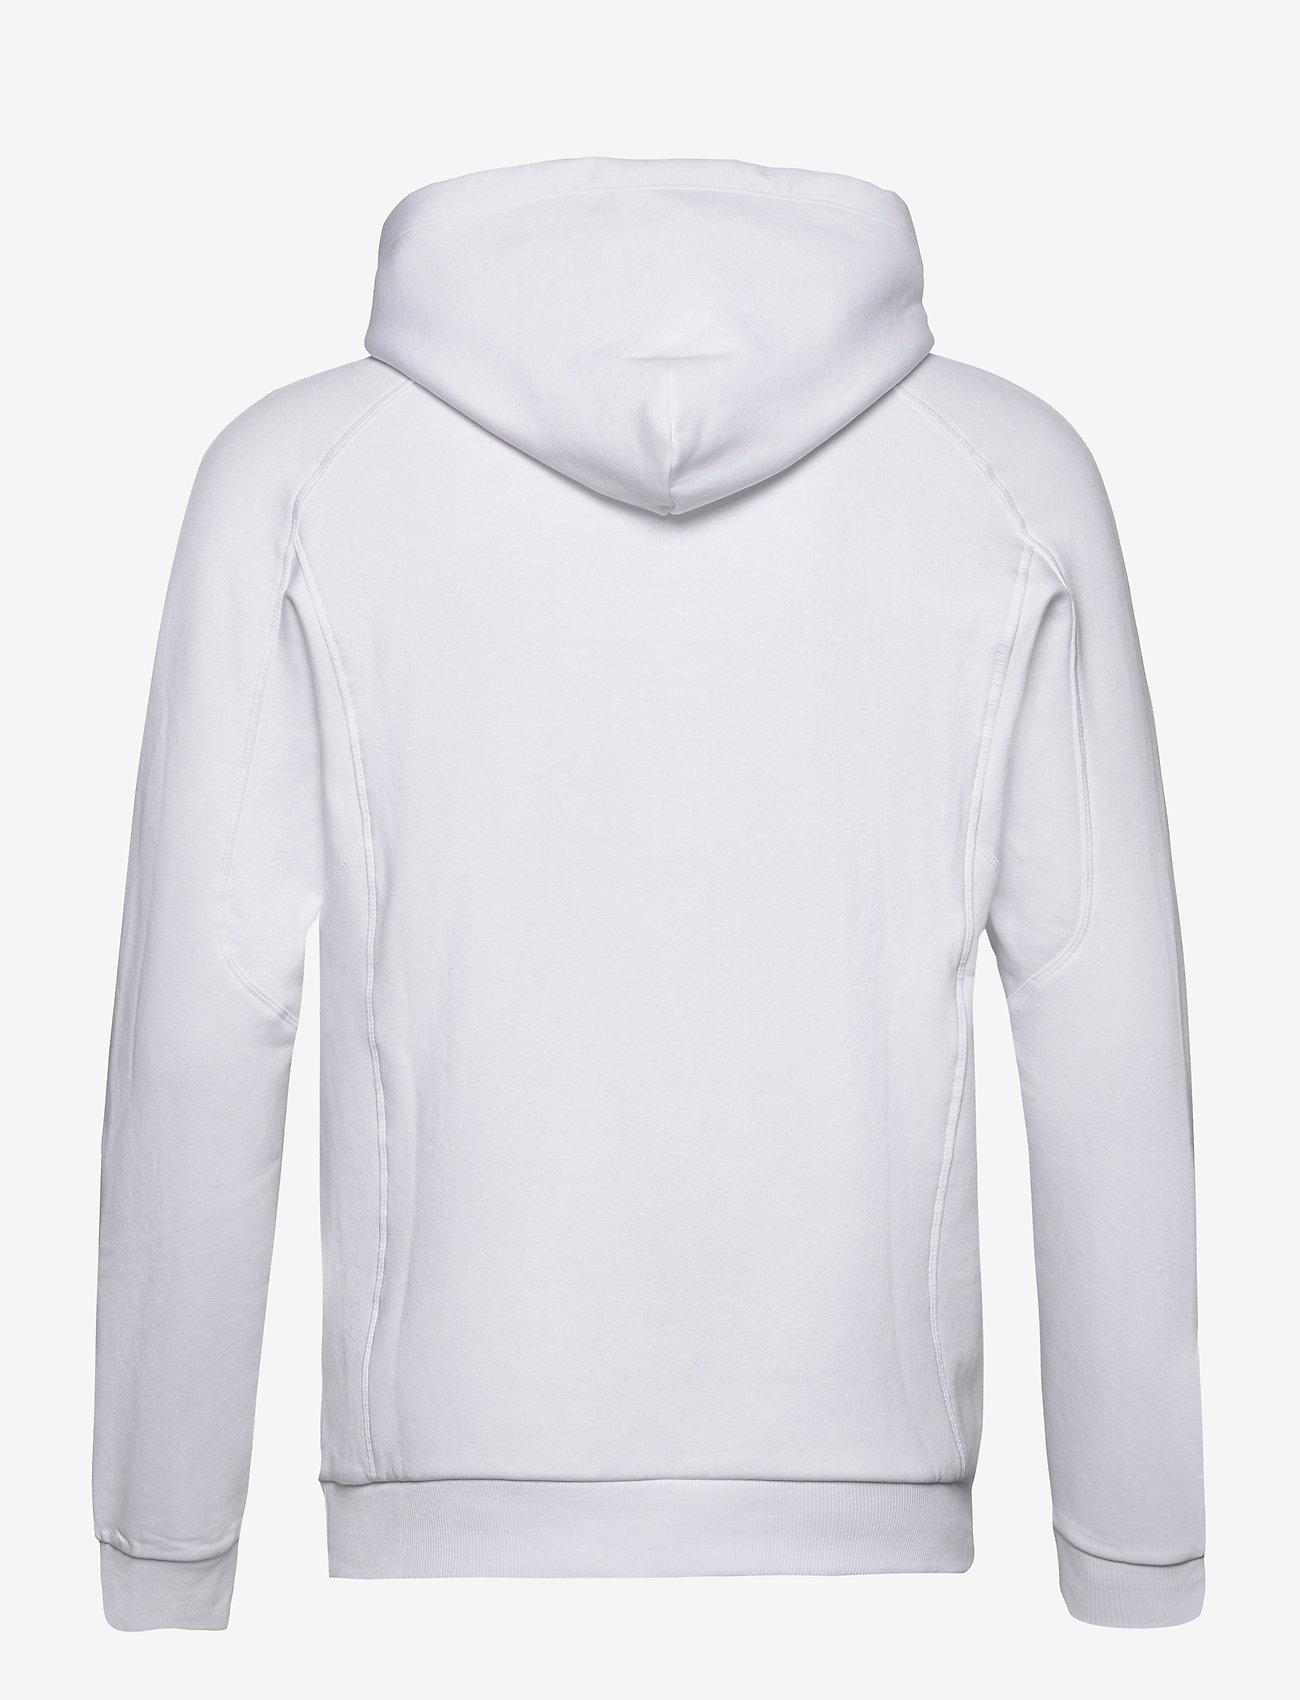 Peak Performance M Ground Hood Black - Sweatshirts WHITE - Menn Klær